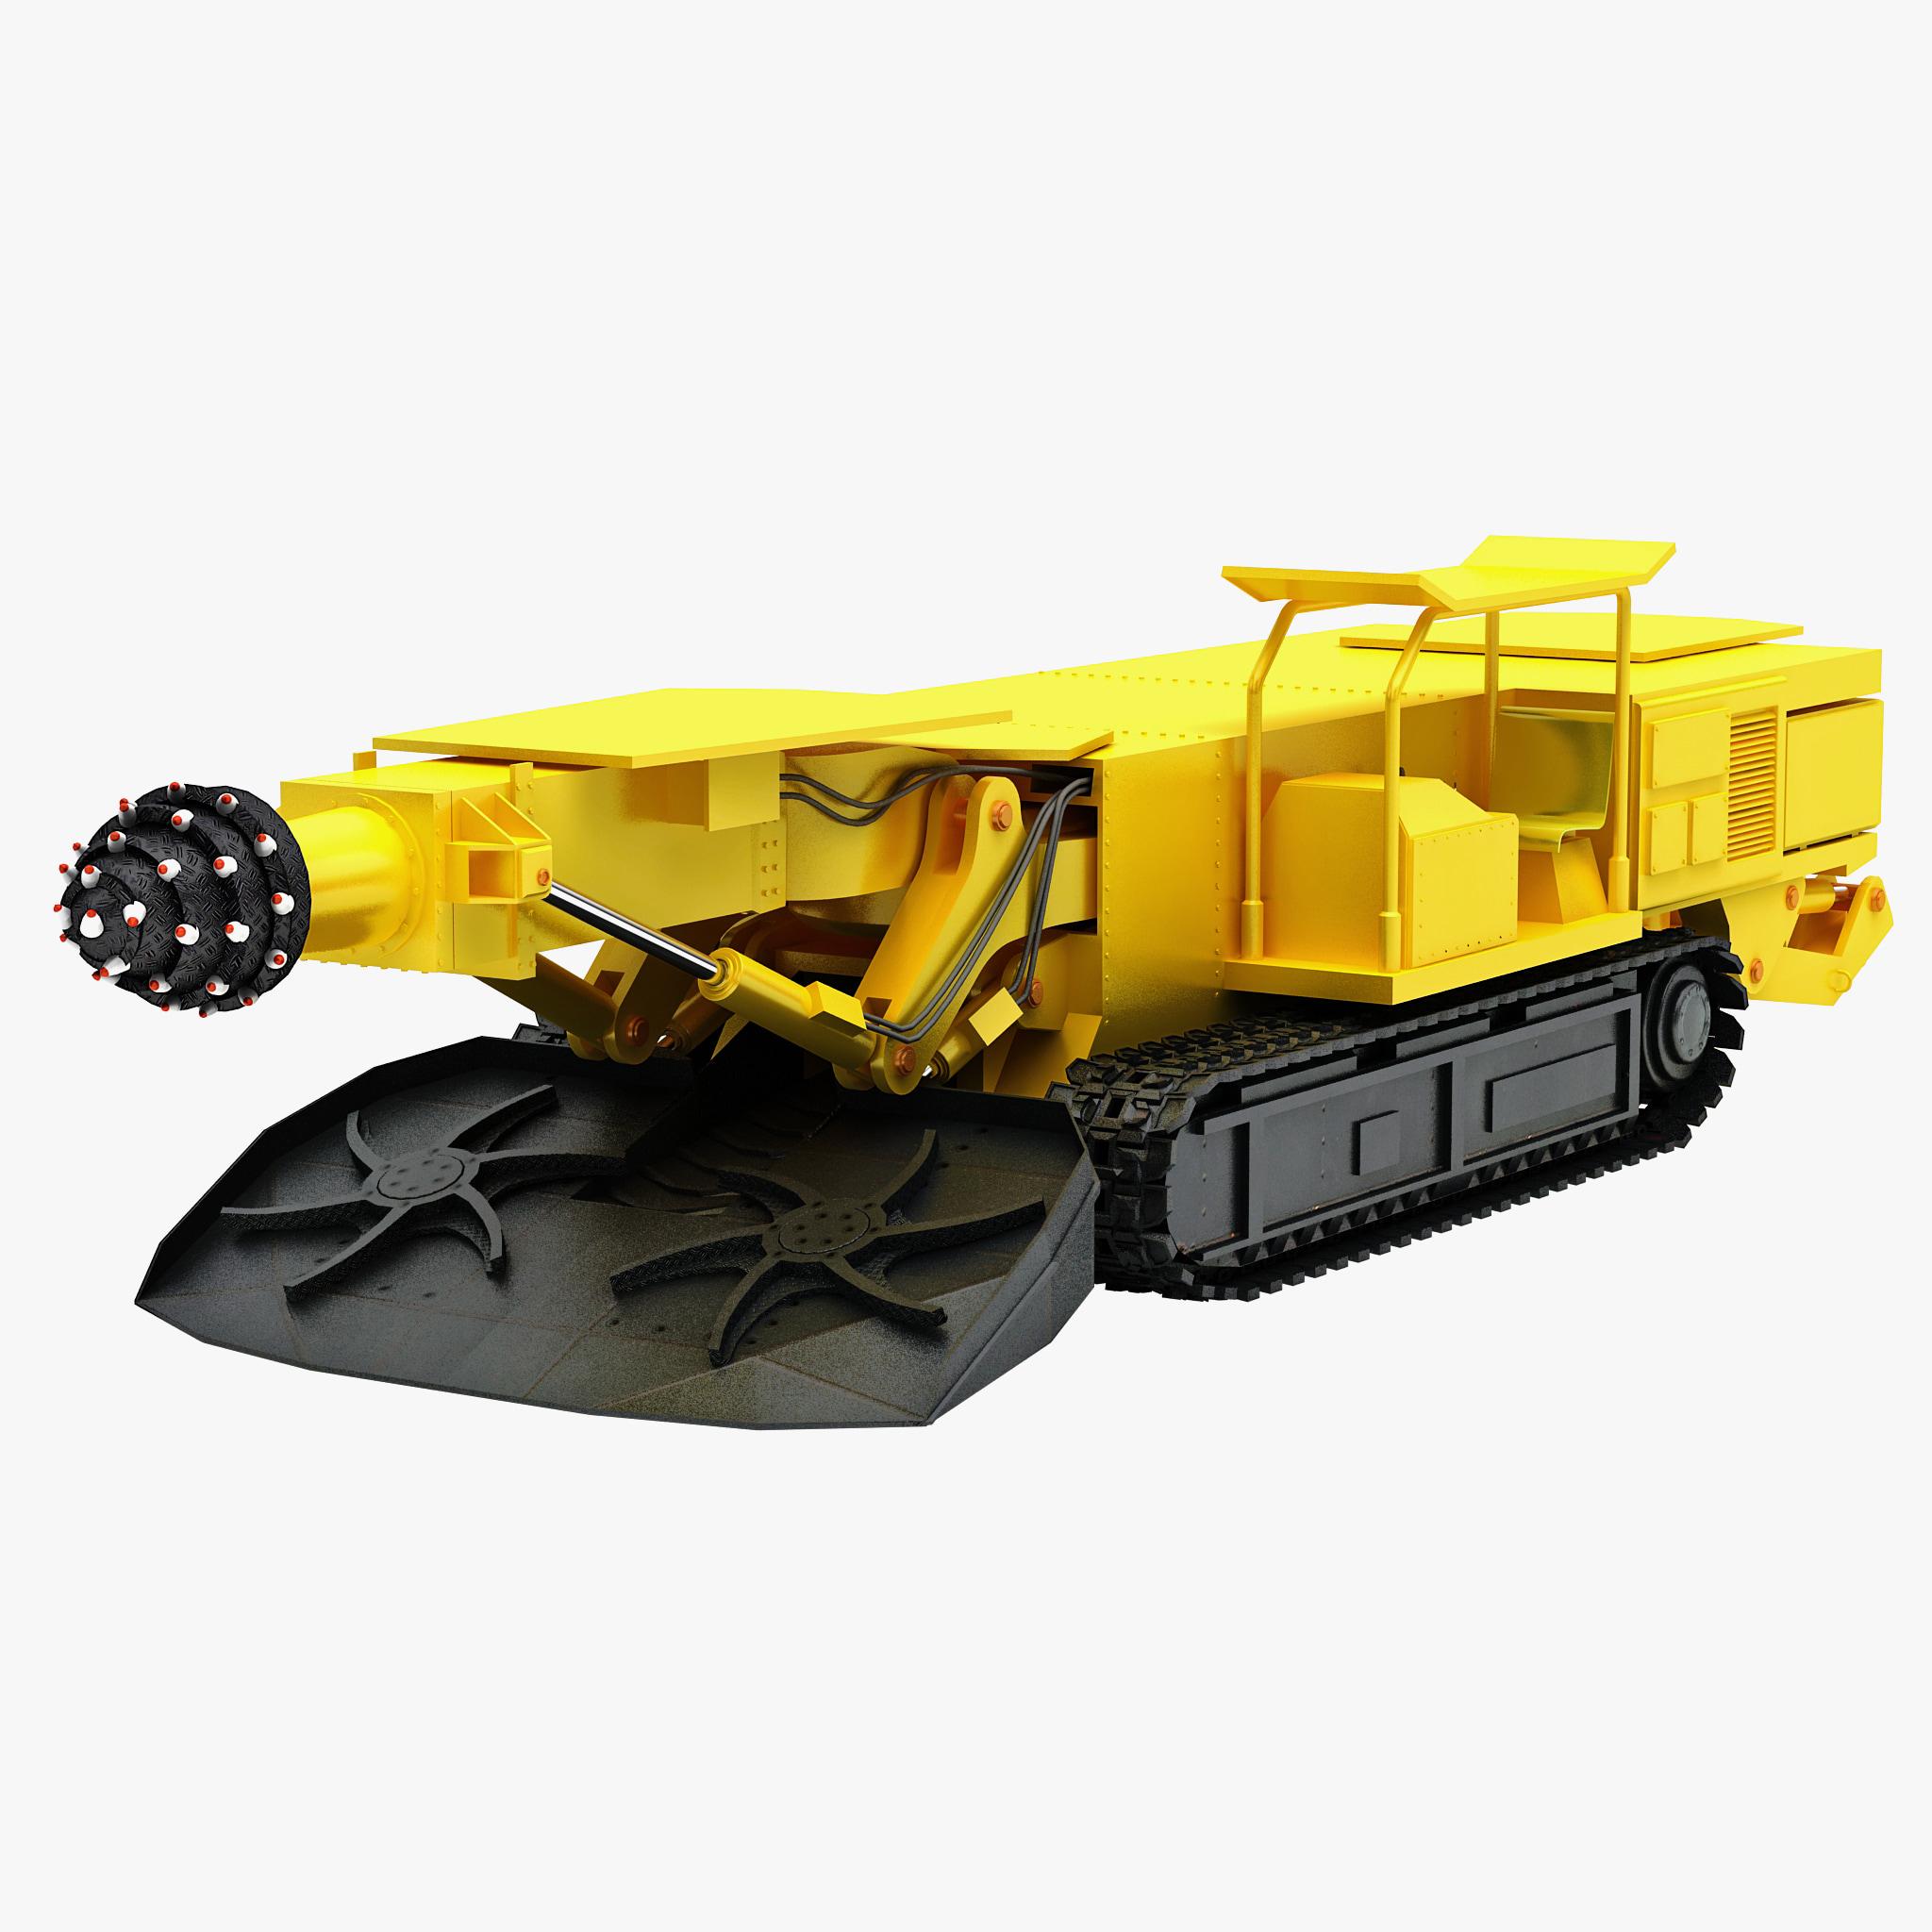 Coal Mining Drill Rig_172.jpg